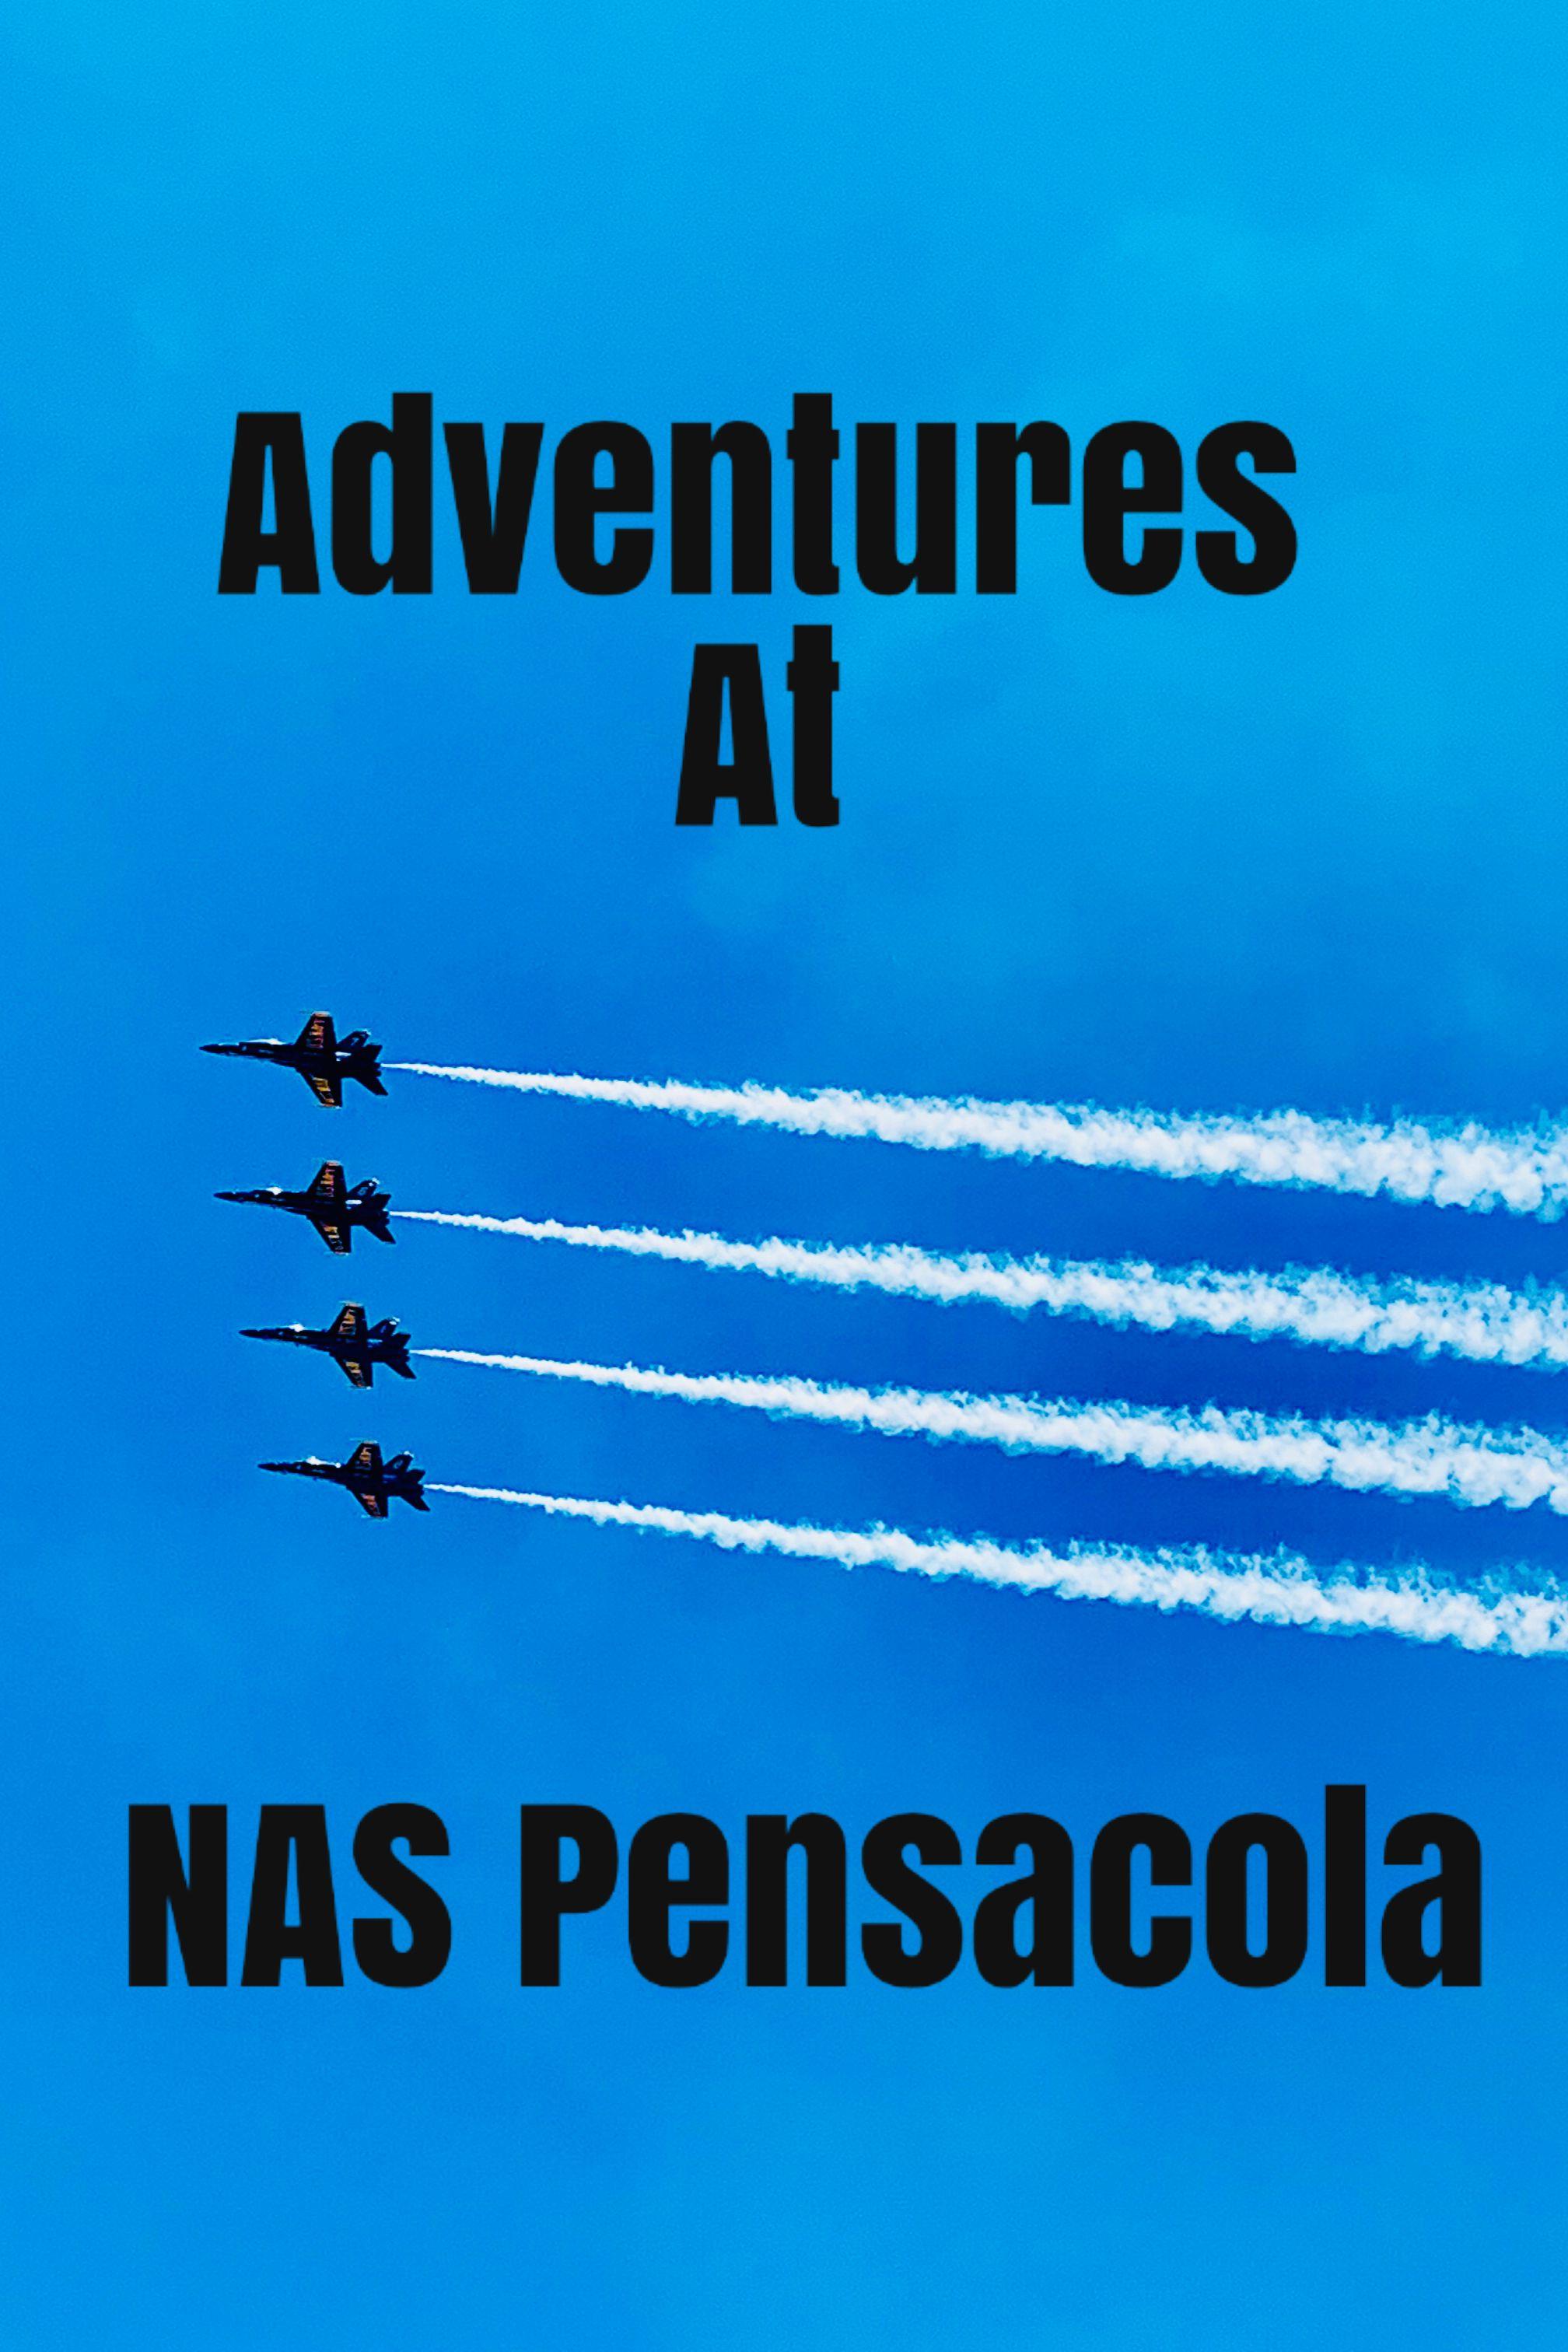 Adventures at NAS Pensacola Coast guard stations